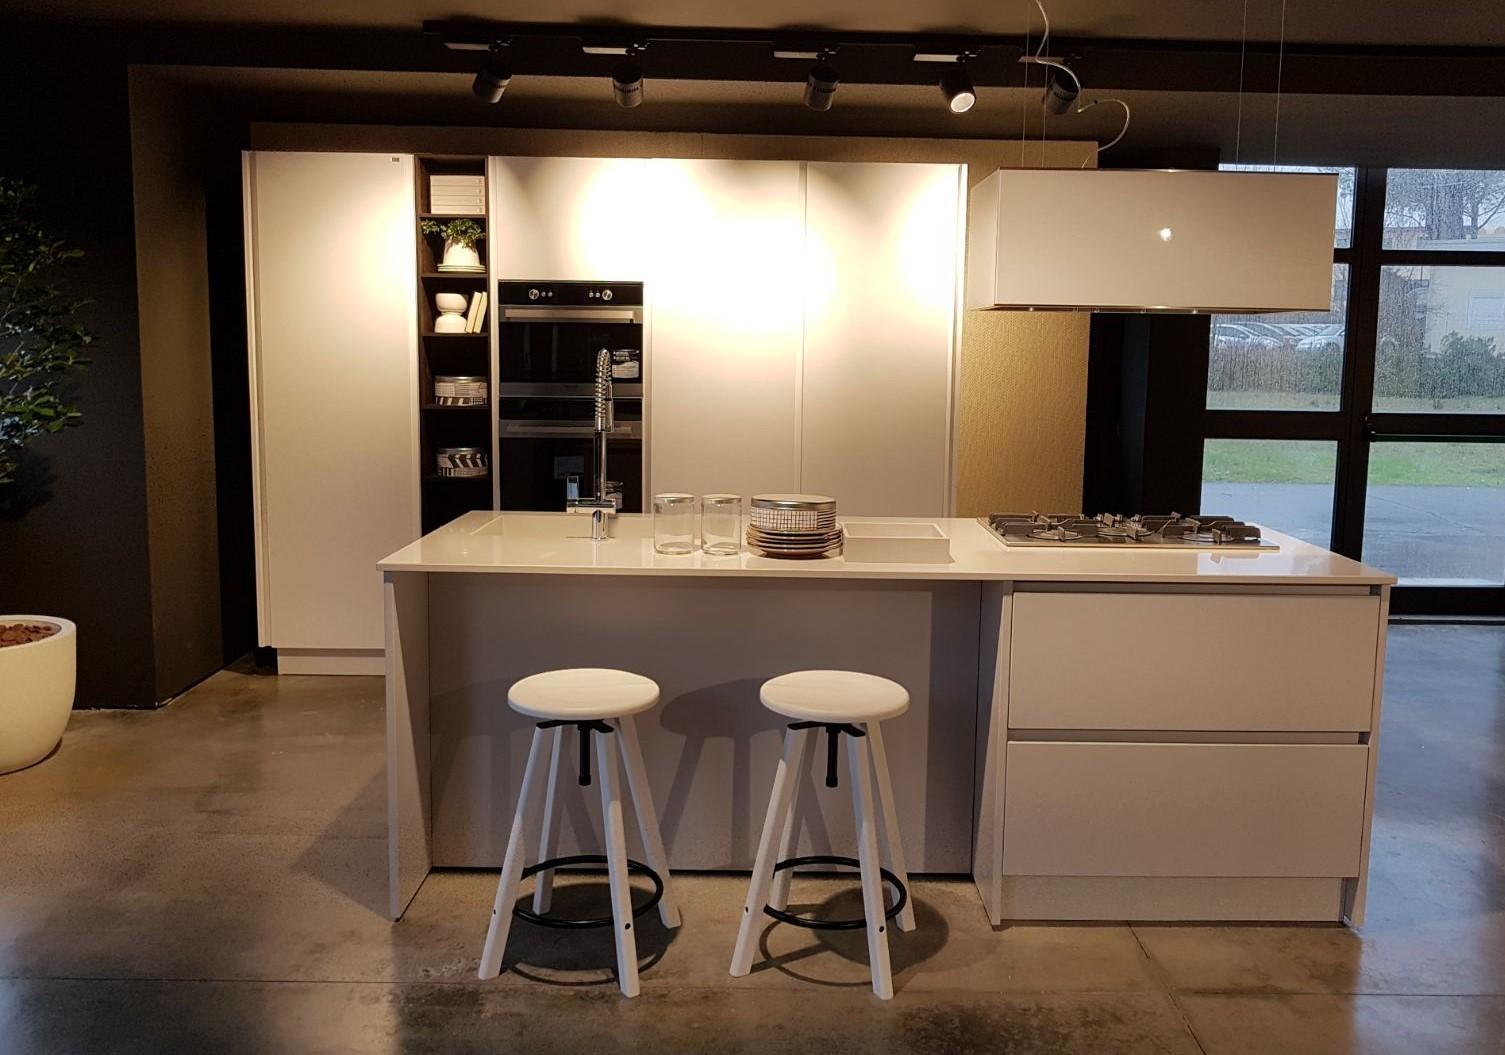 Gruppo LUBE opens a new Store in San Gemini (Terni) - Cucine Lube